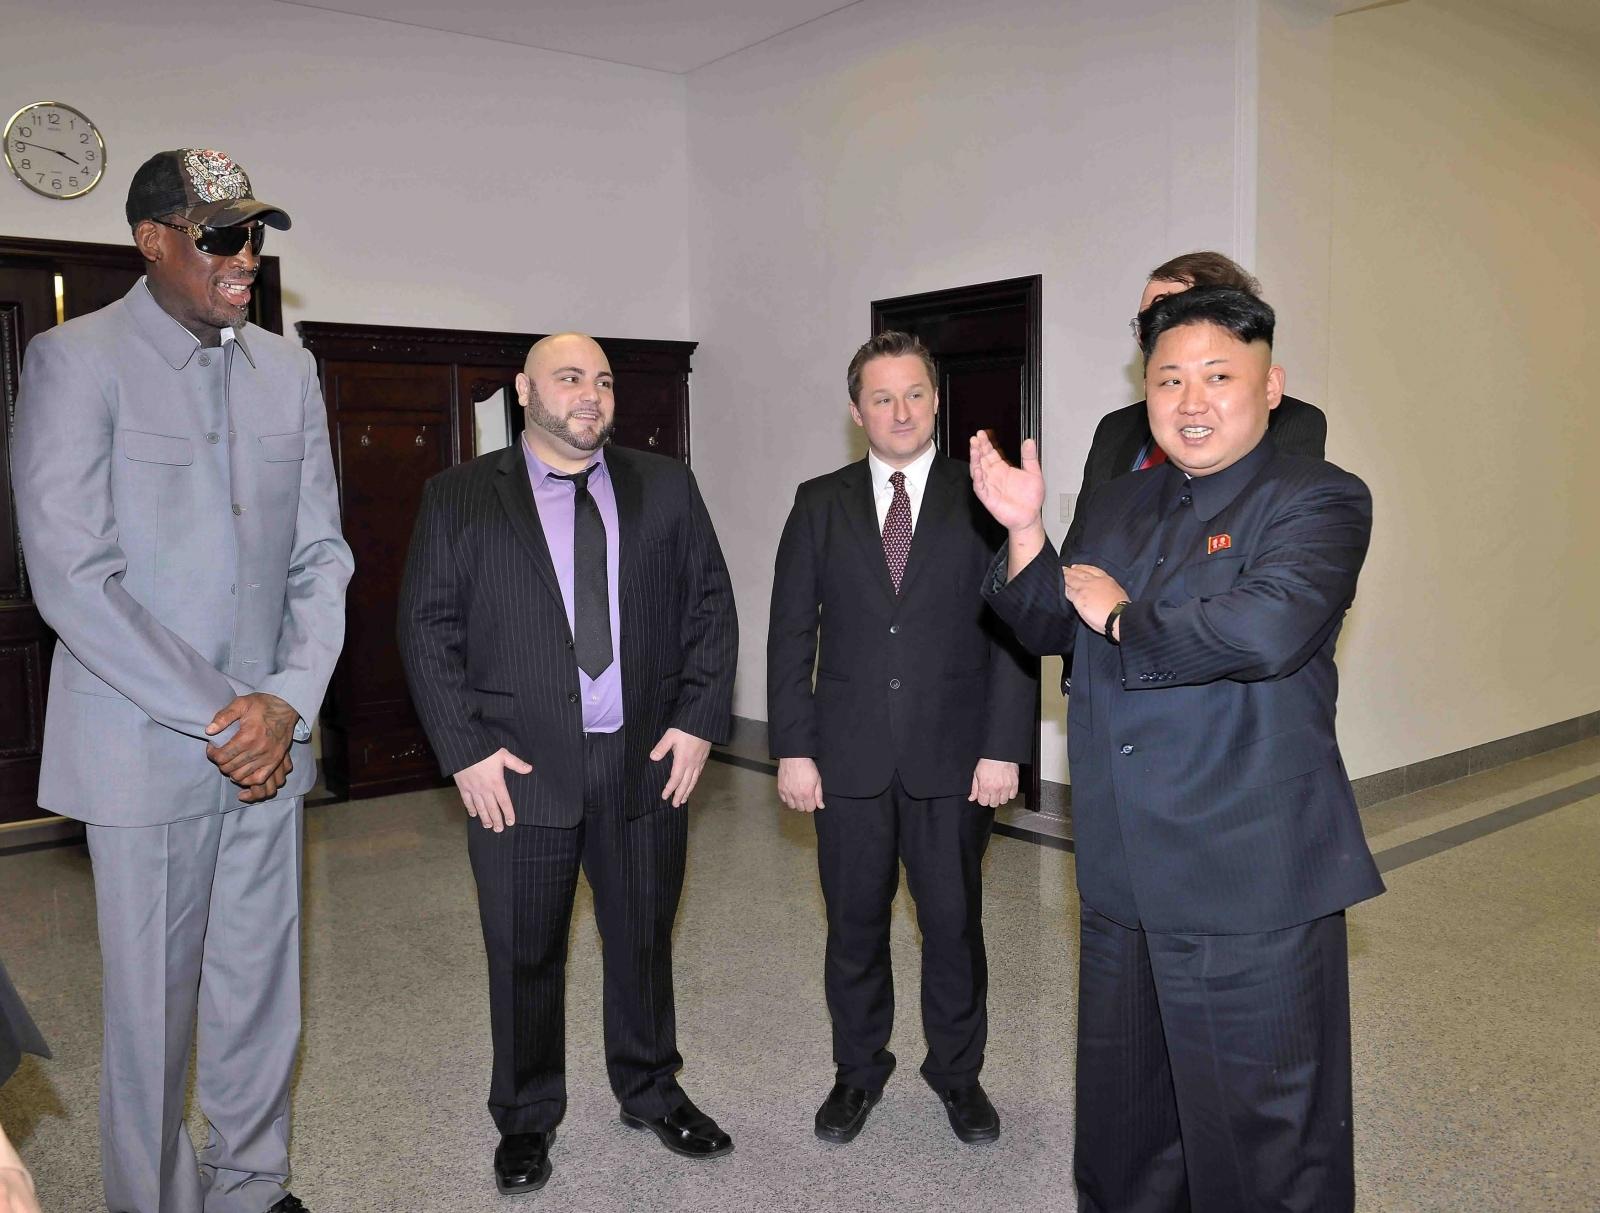 Dennis Rodman and North Korea travel ban